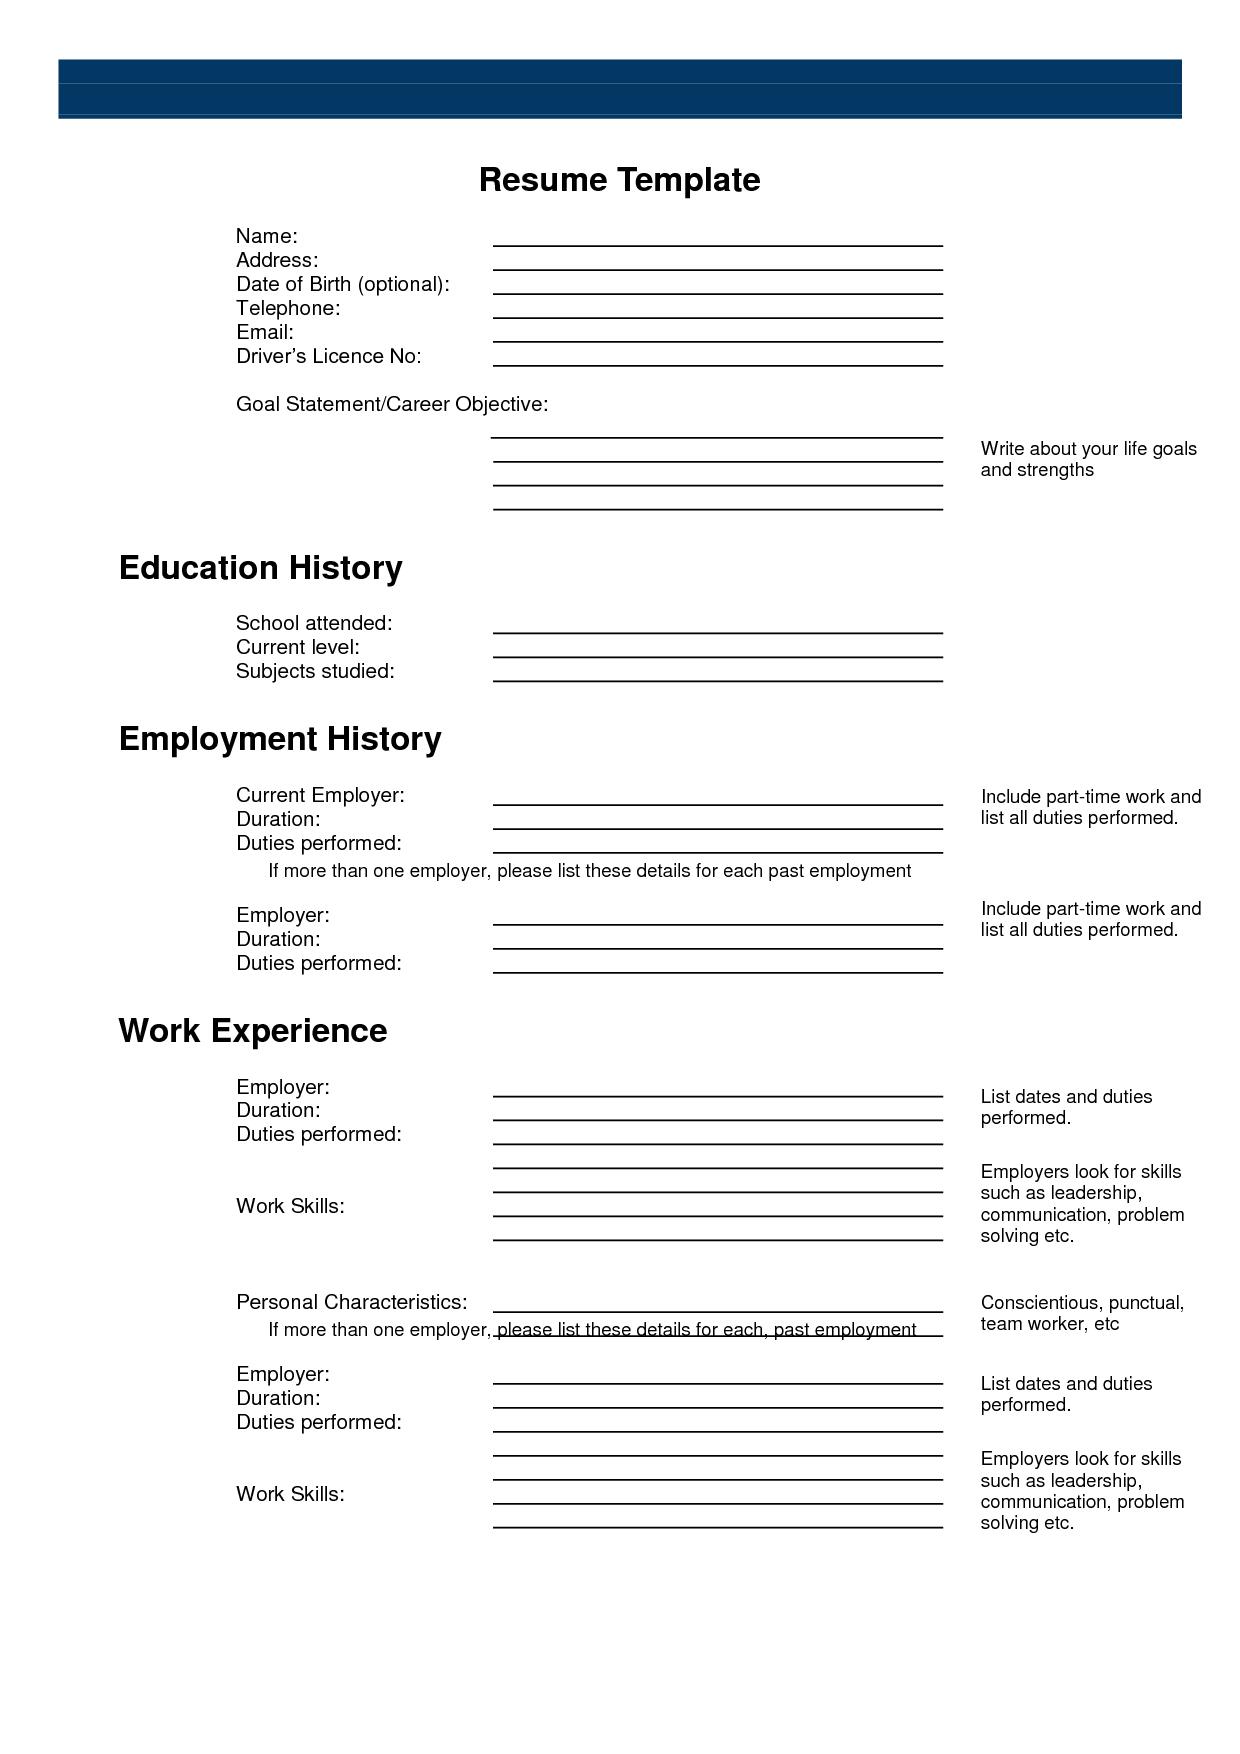 Free Printable Resume Templates Microsoft Word Best Of 23 Template - Free Printable Resume Templates Microsoft Word